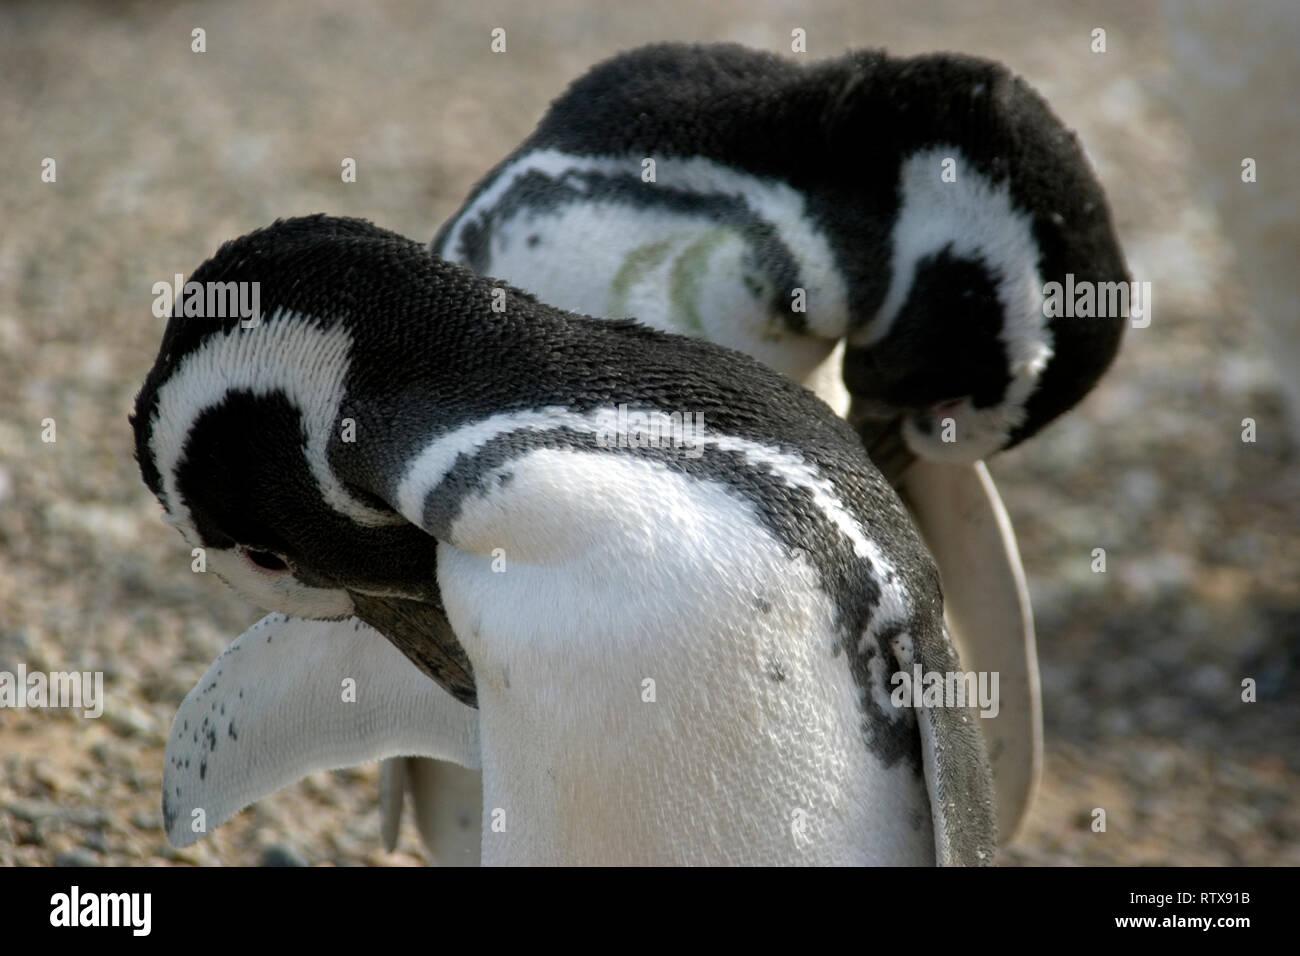 Les manchots de Magellan, Spheniscus magellanicus, Pinguinera Punta Tombo, Rawson, Chubut, en Patagonie argentine Banque D'Images